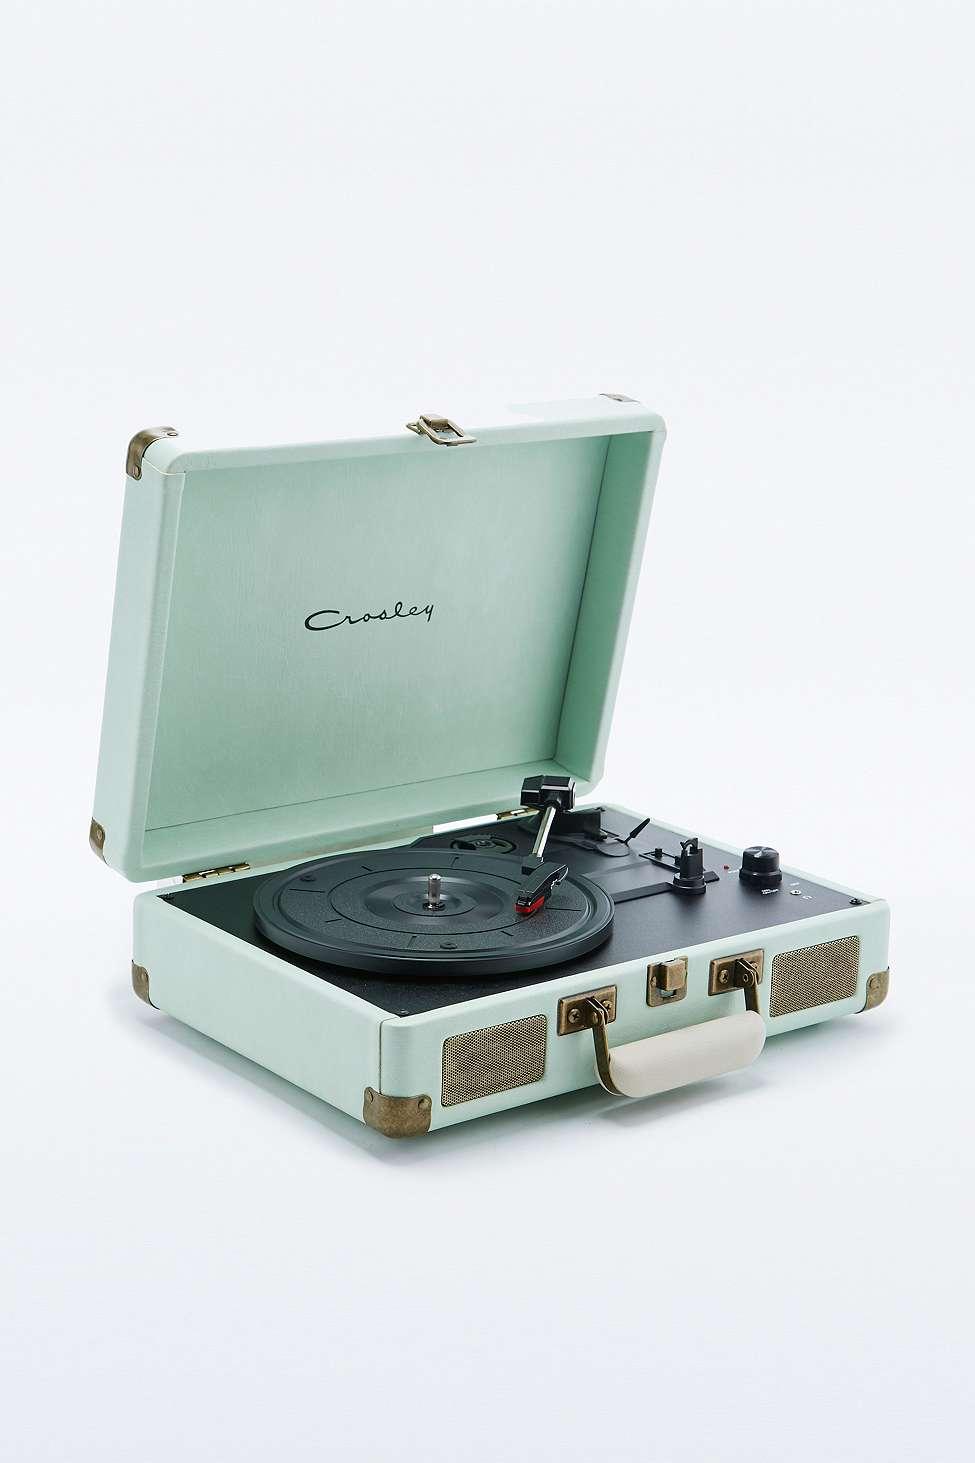 Tourne-disque Cruiser